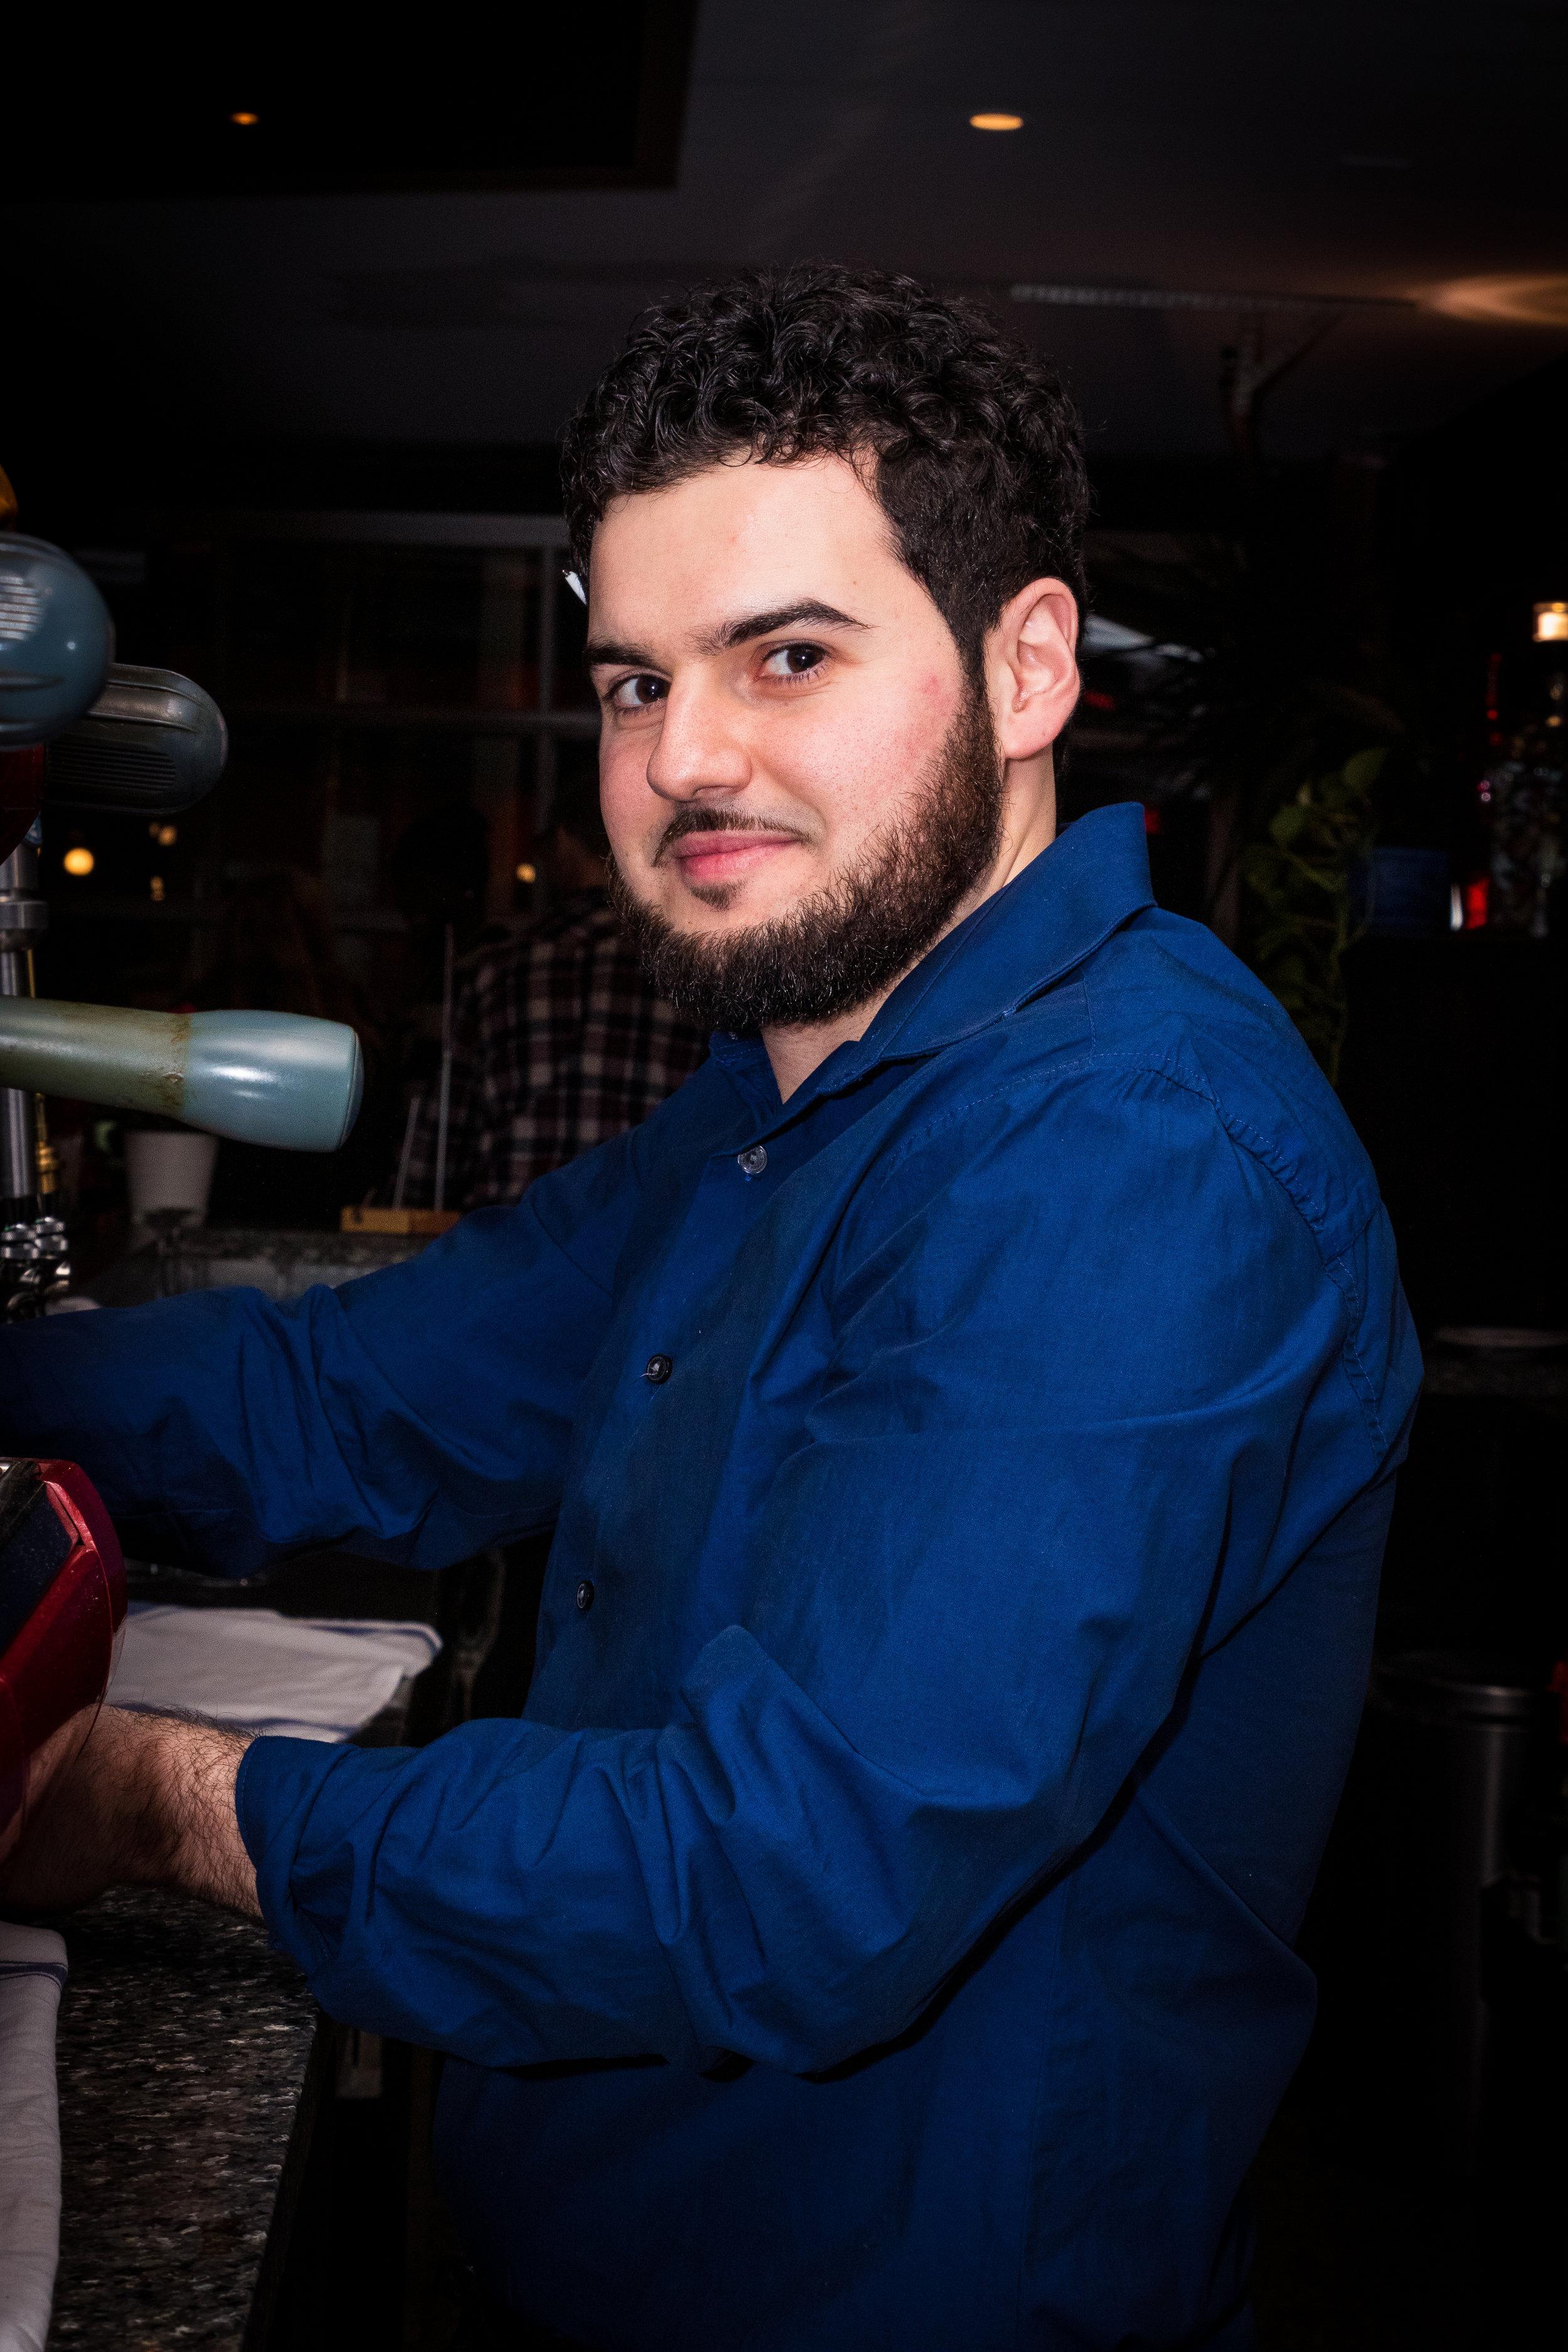 Christoper Spataro - Co-Owner, Salto Restaurant & Bar